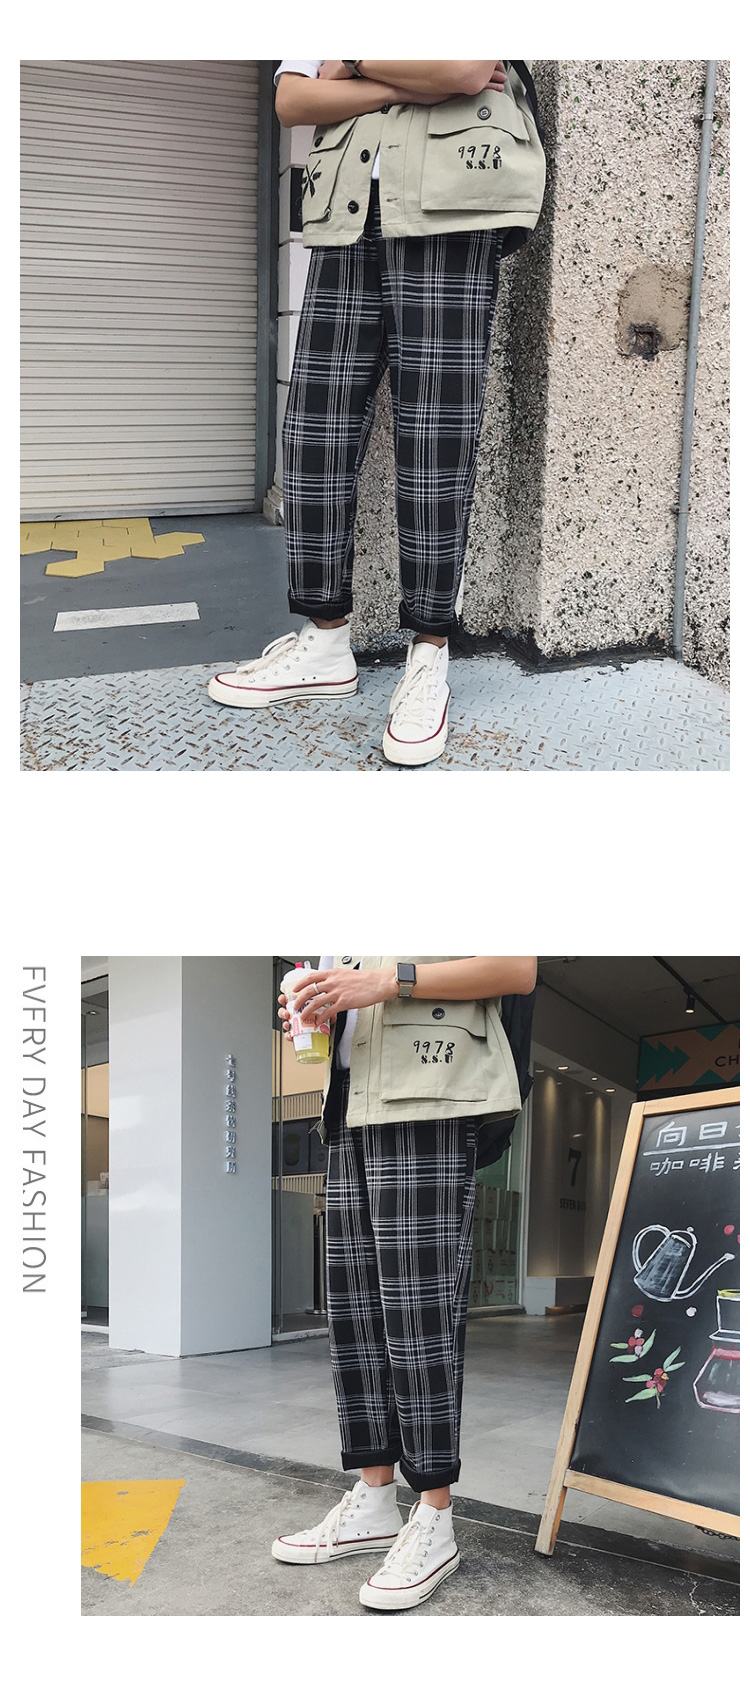 HTB1DzqnbEjrK1RkHFNRq6ySvpXaK LAPPSTER Streetwear Yellow Plaid Pants Men Joggers 2019 Man Casual Straight Harem Pants Men Korean Hip Hop Track Pants Plus Size